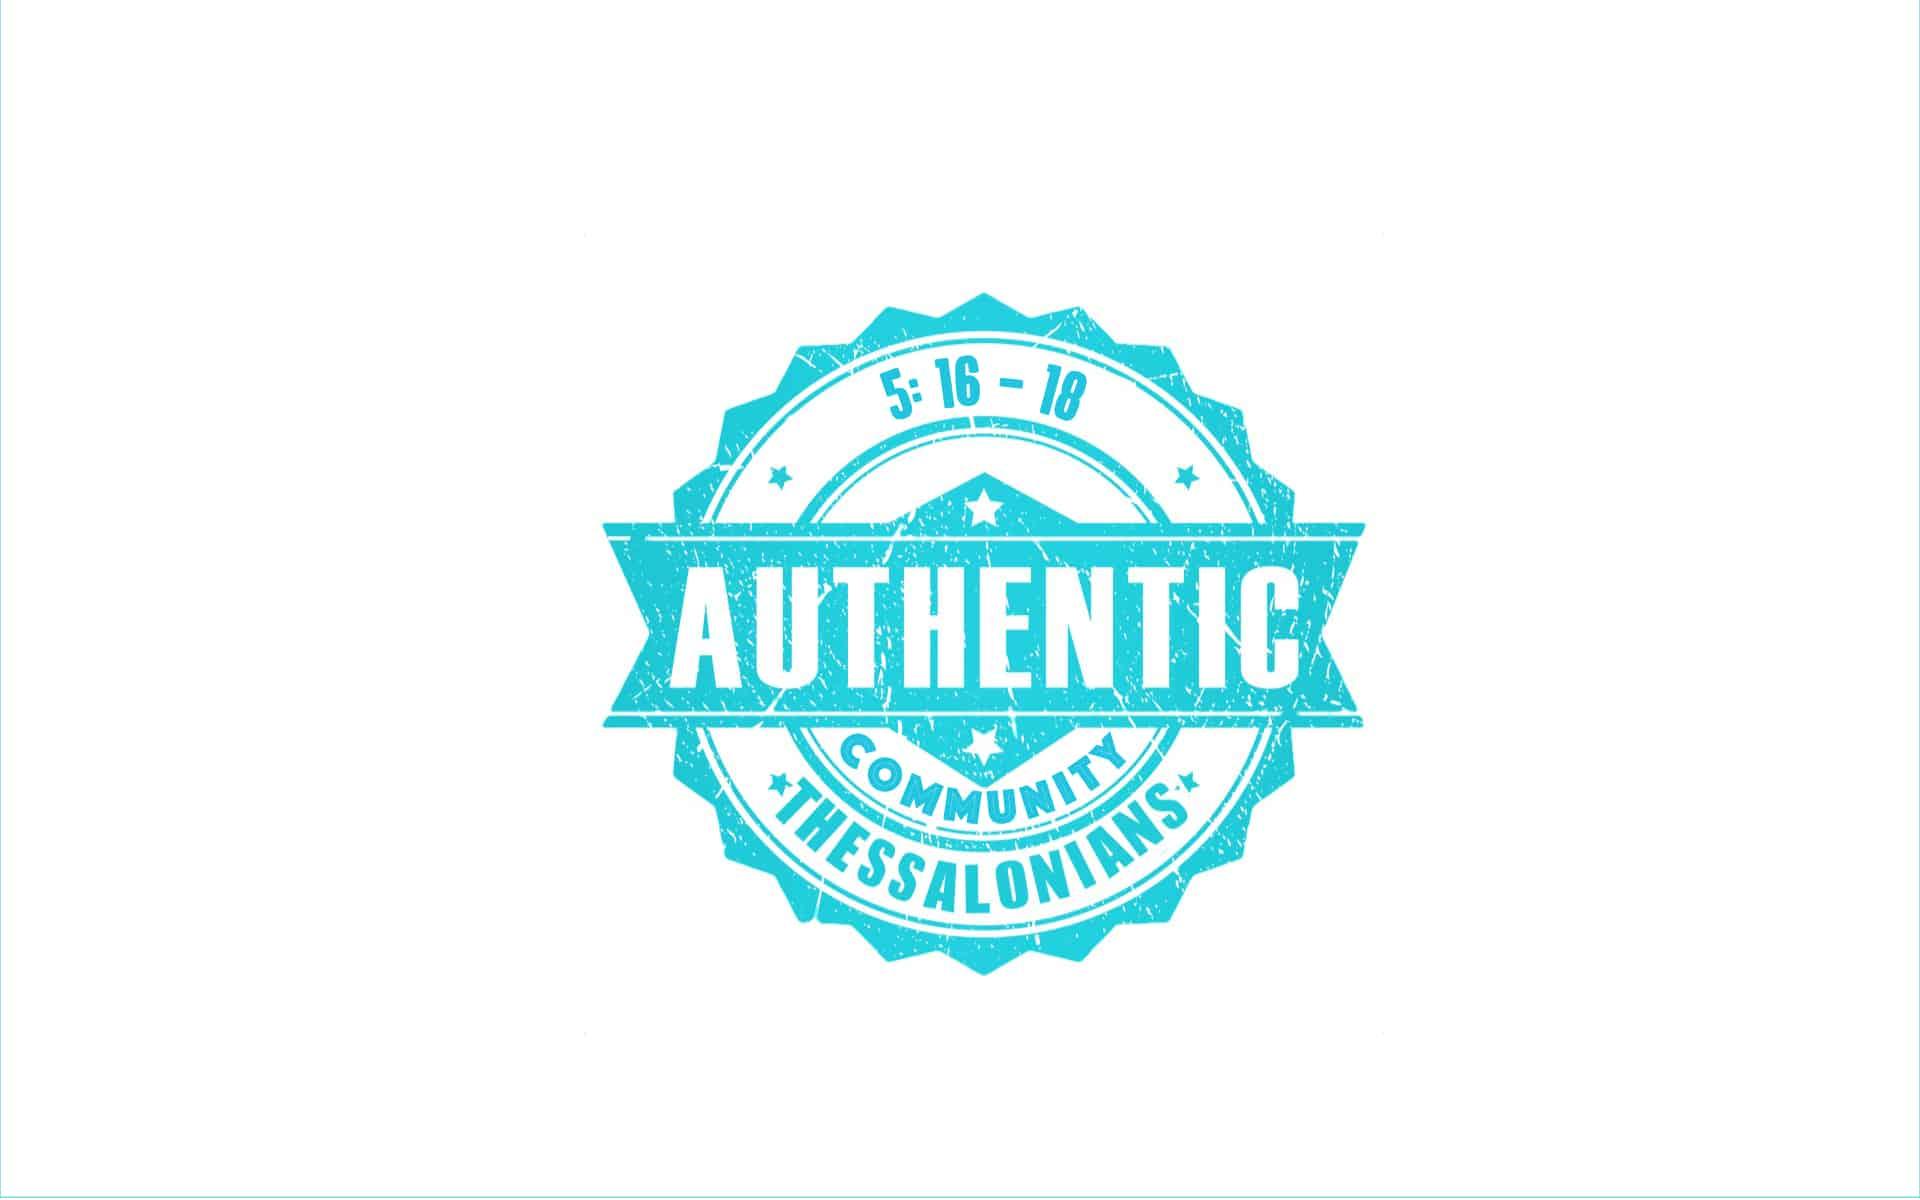 Authentic Community #3